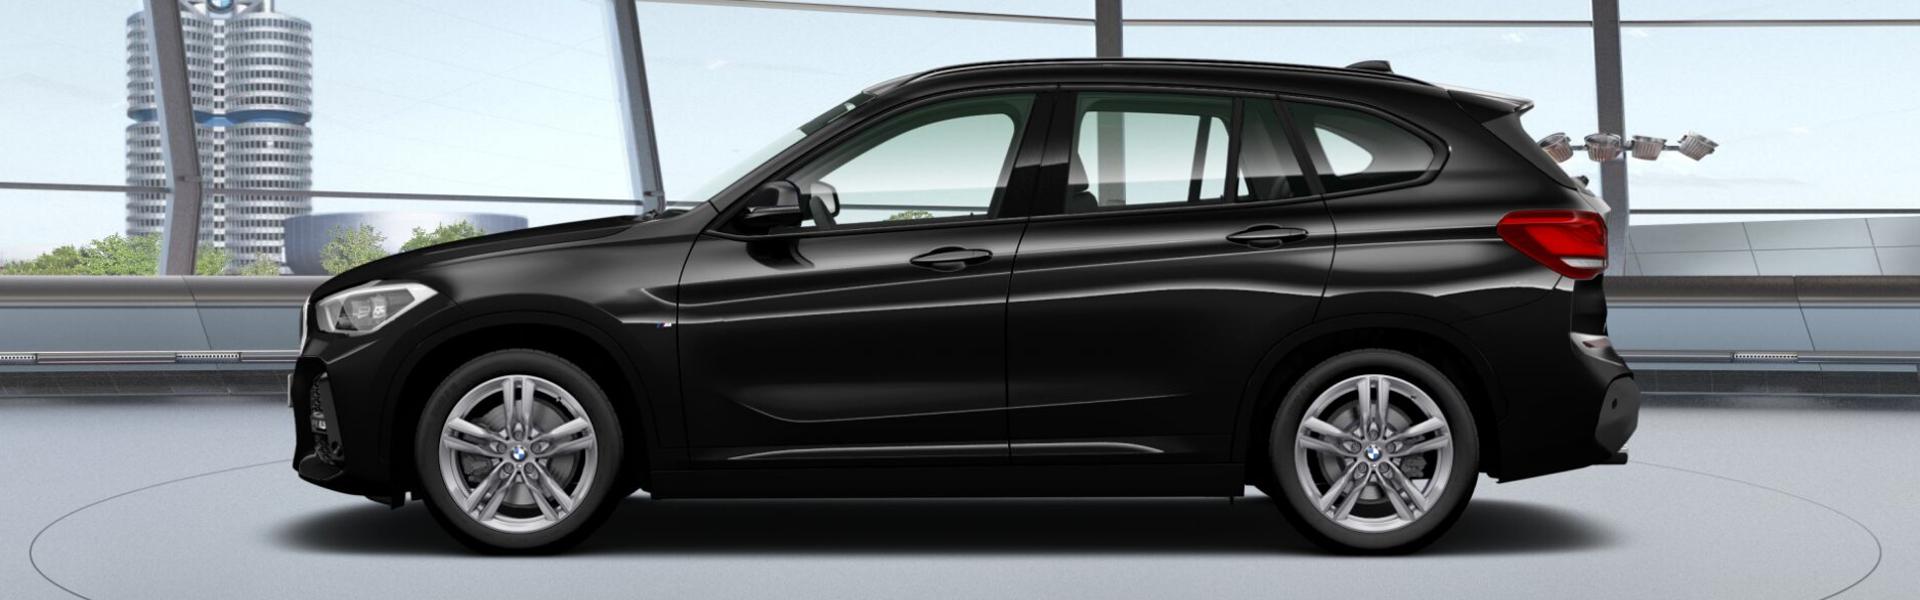 BMW X1 sDrive18i AB 249,- EUR MTL. LEASINGRATE.